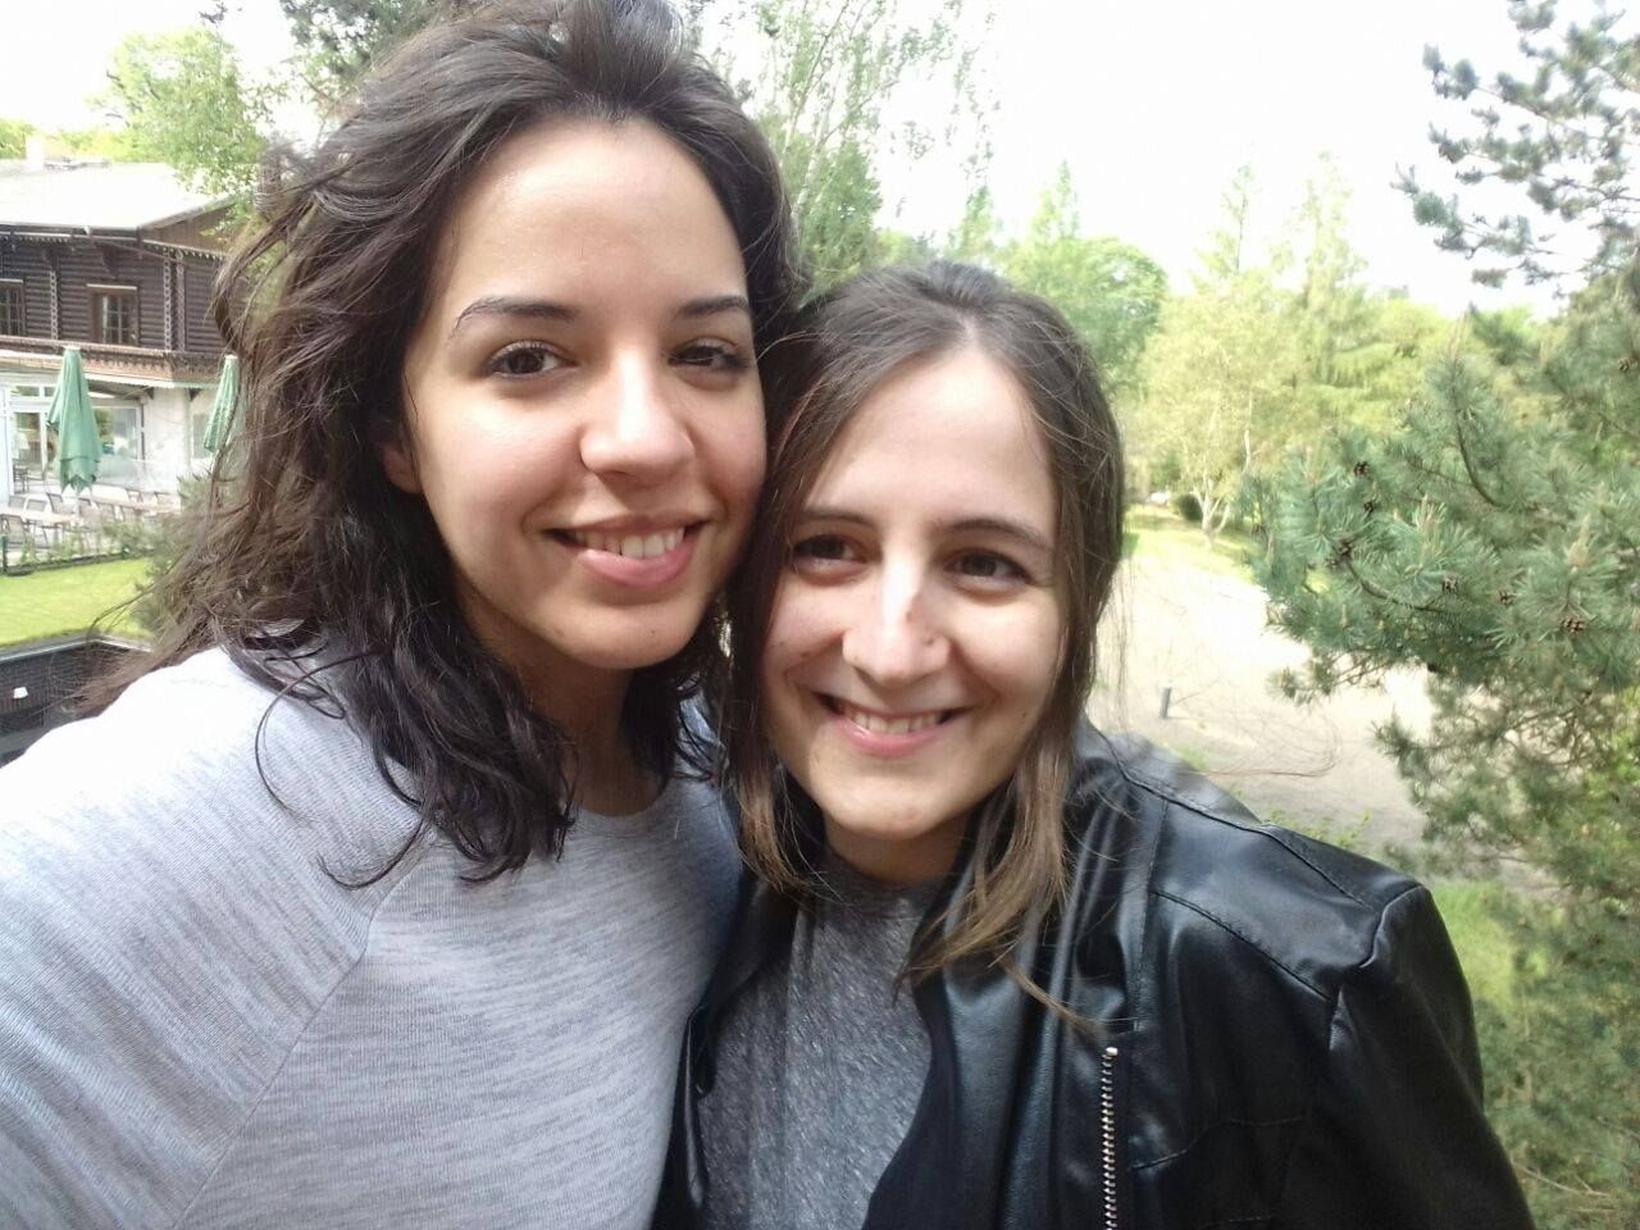 Stefanie & Christiane from Berlin, Germany